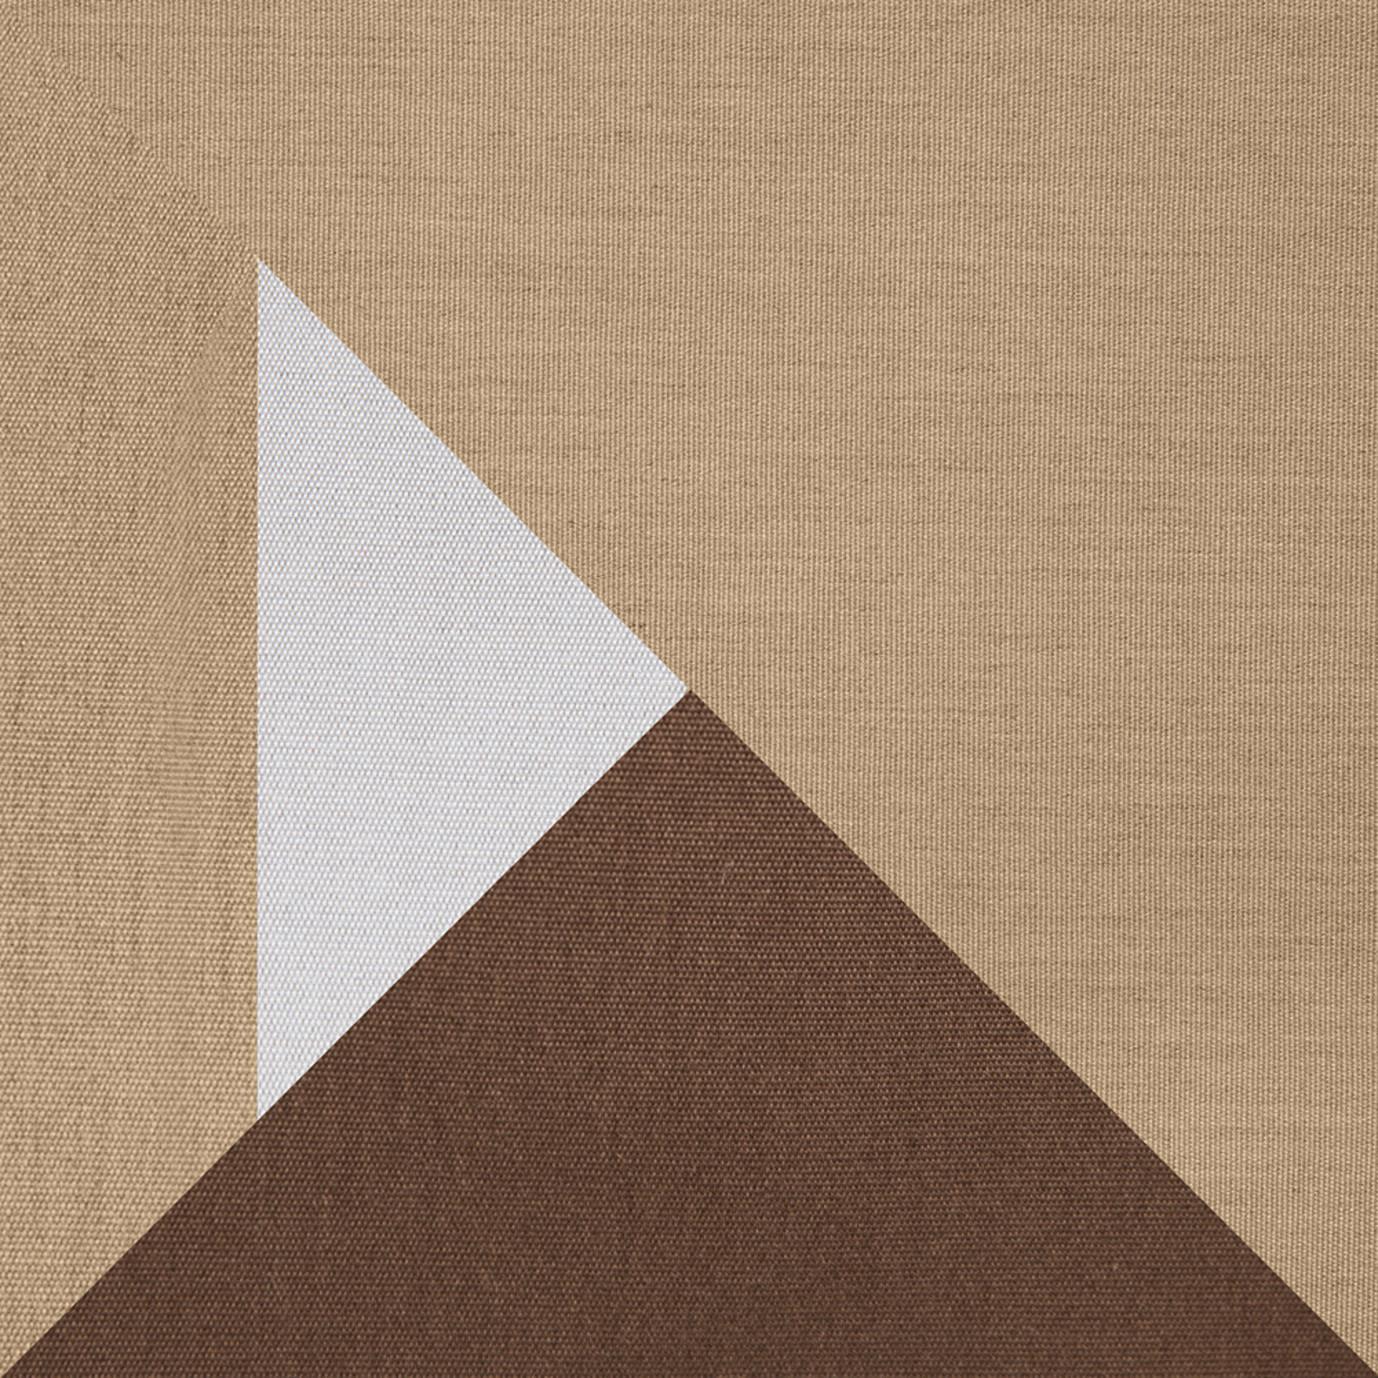 Milo Gray 4 Piece Sectional - Maxim Beige